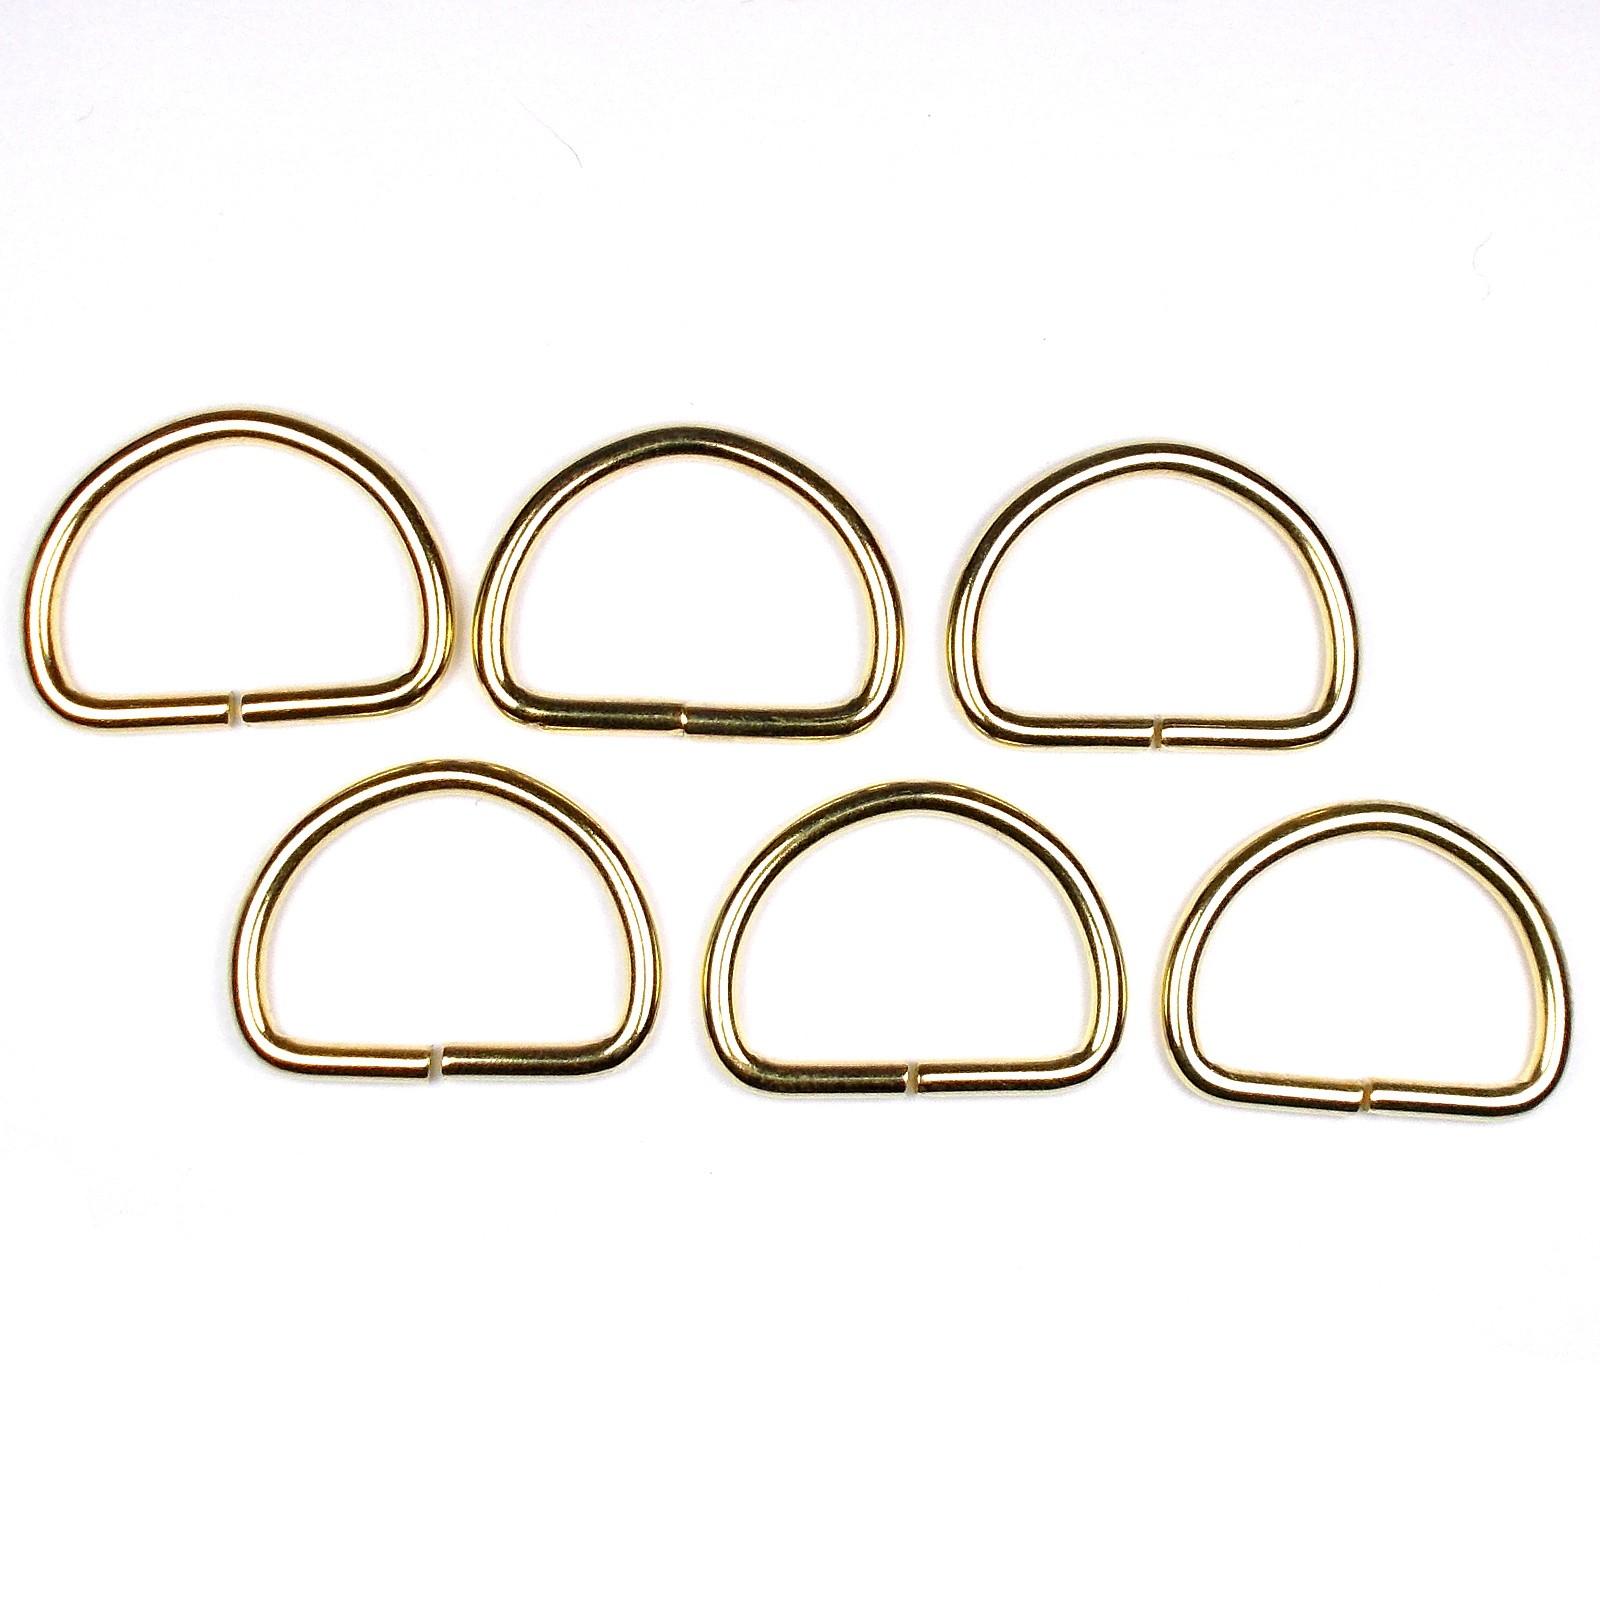 Gold Metal D Rings 29mm Pack of 6